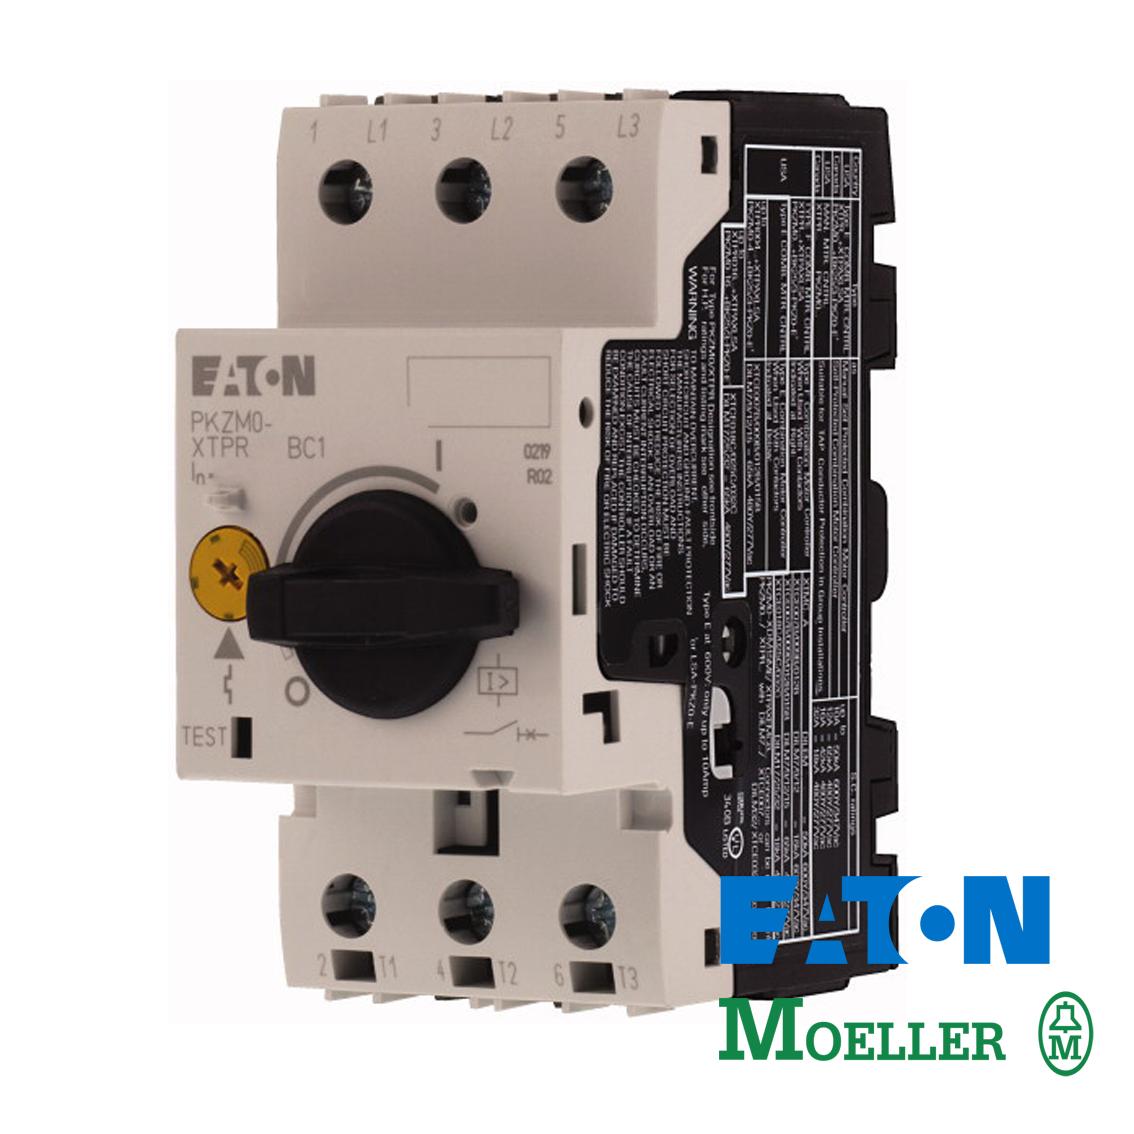 Motorni zaštitni prekidač PKZM0-6,3 Eaton-Moeller Elektro Vukojevic